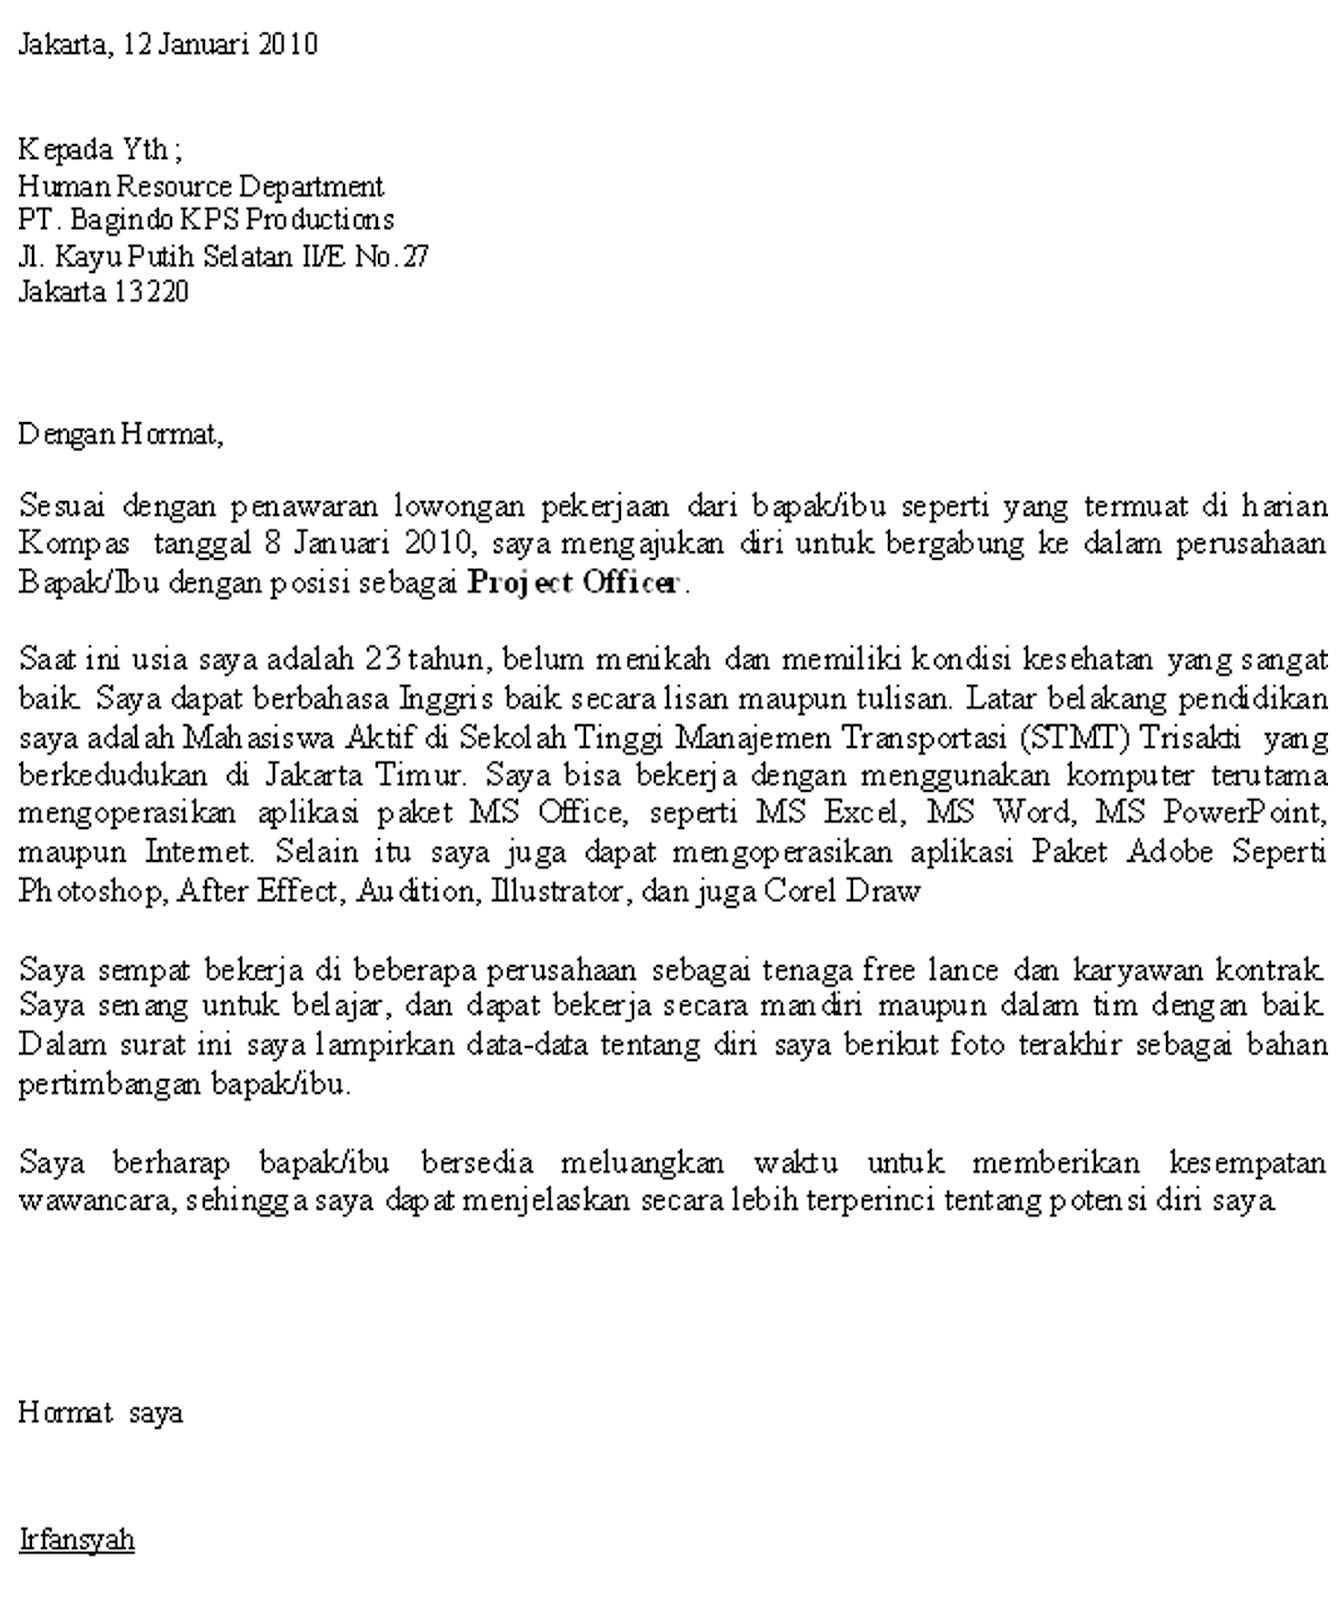 Contoh surat lamaran kerja via email dalam bahasa inggris